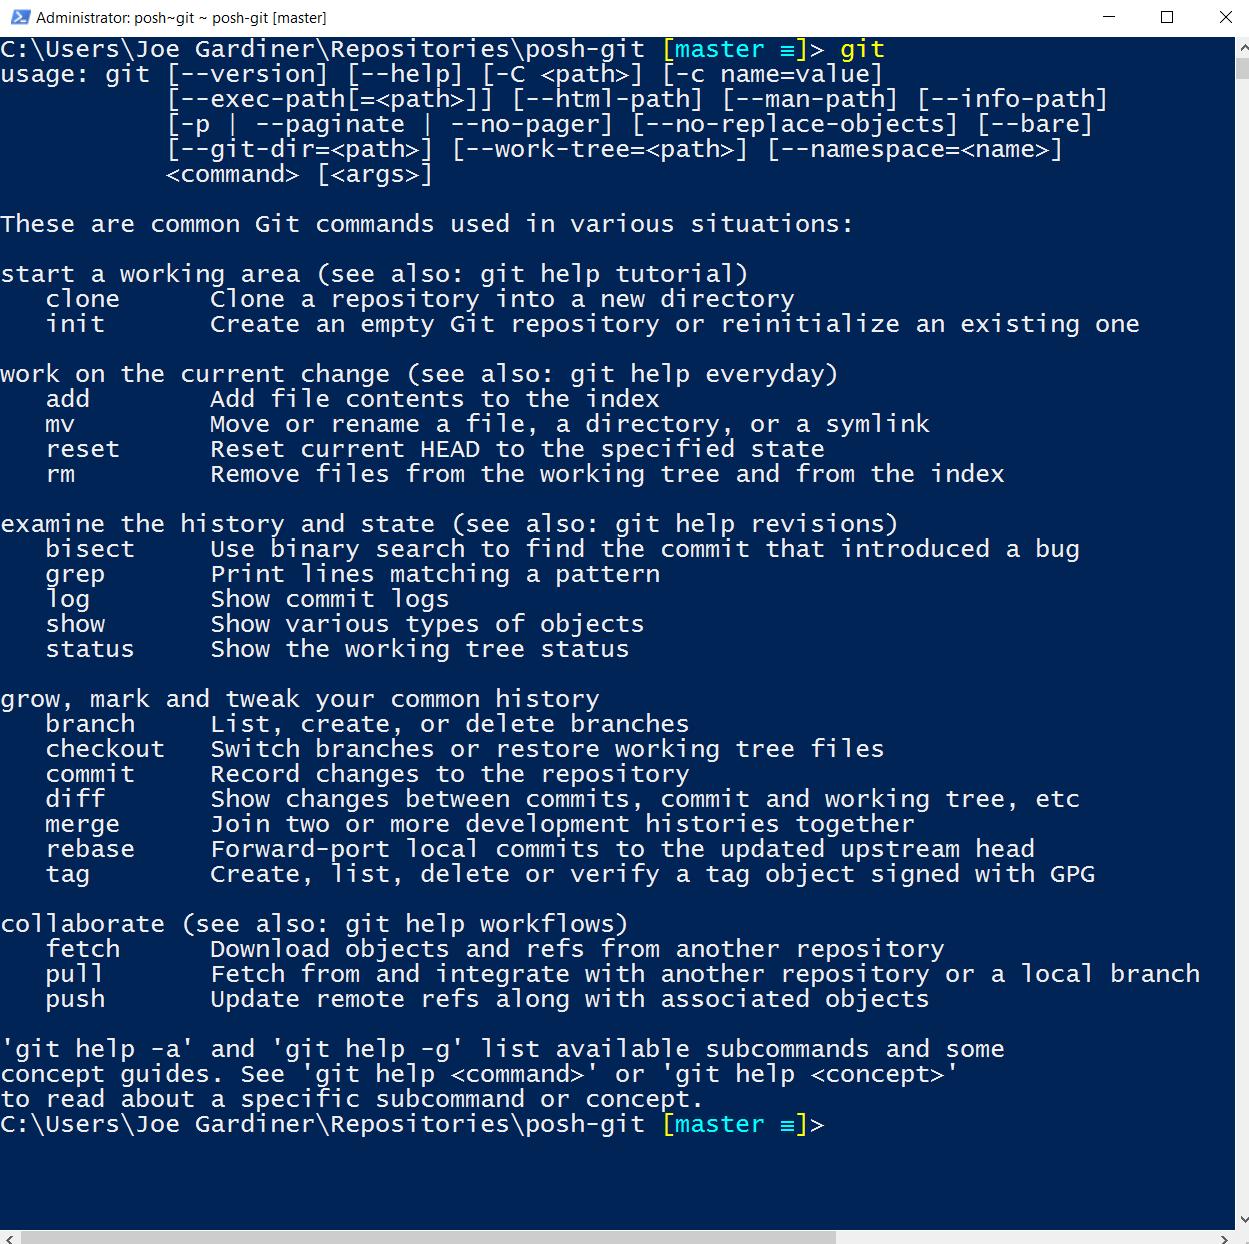 Git Powershell output